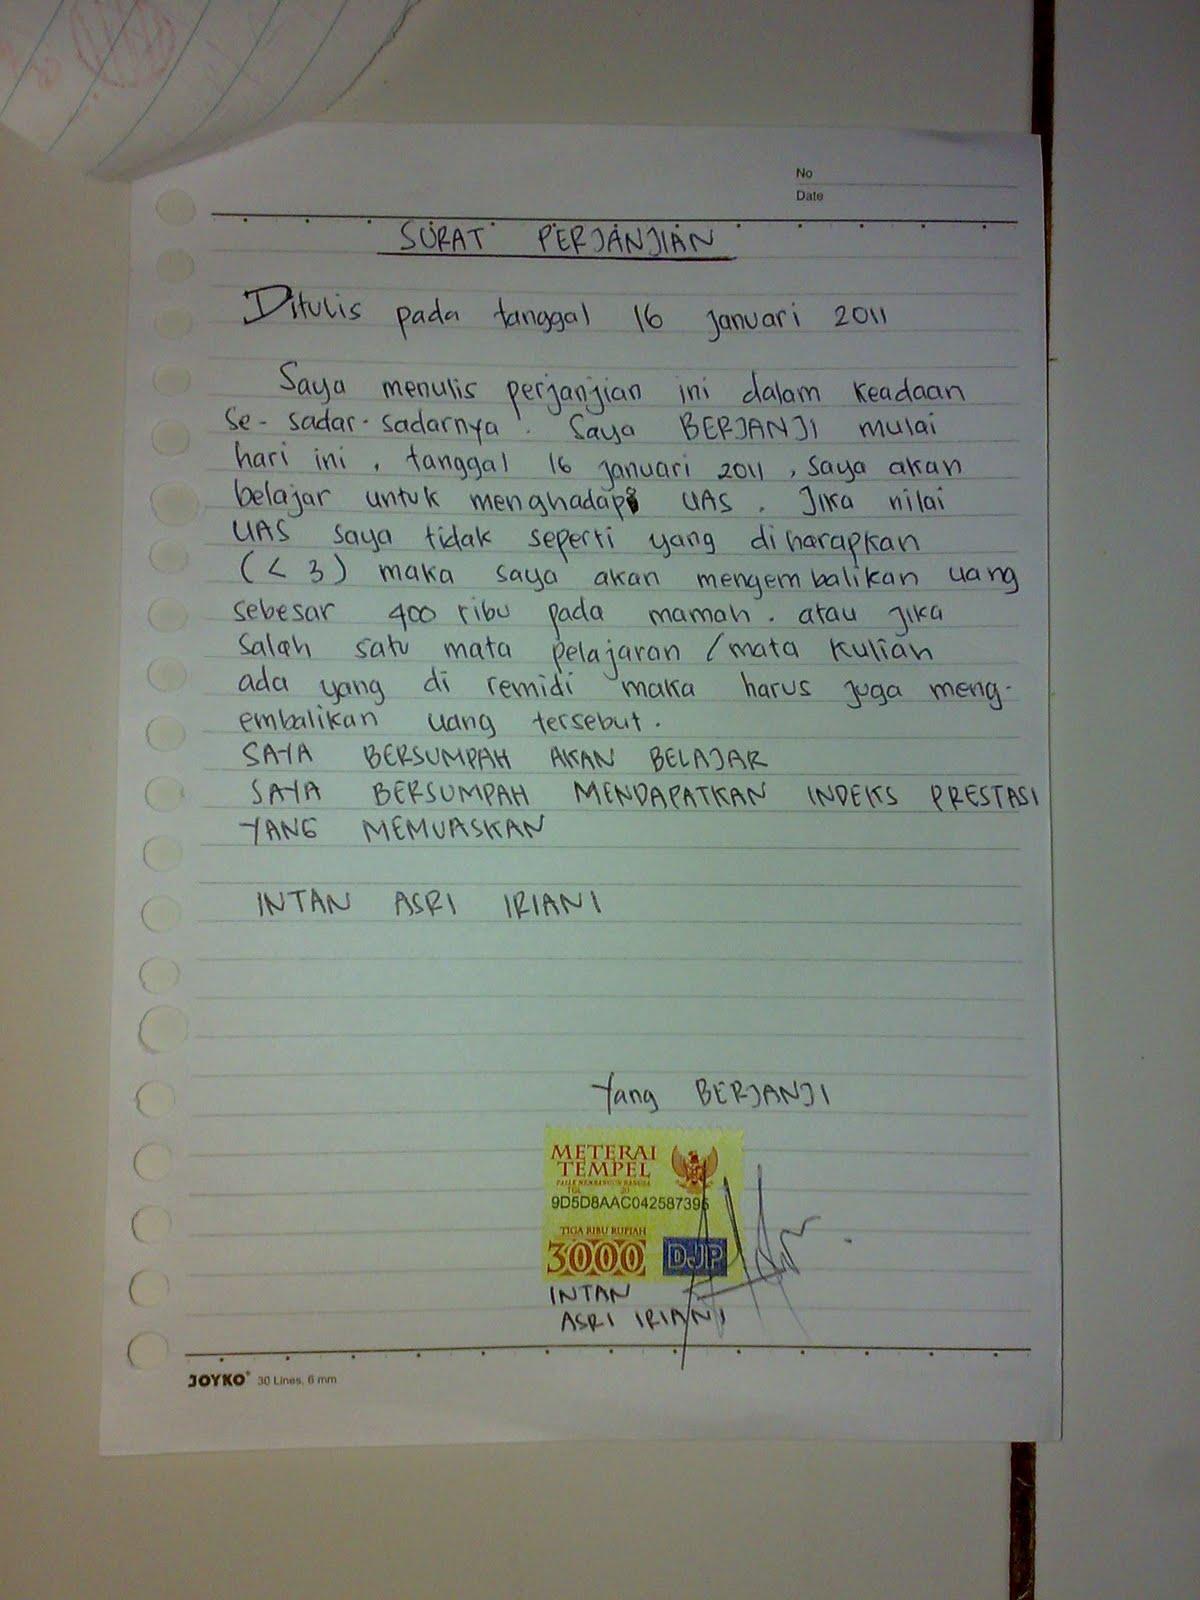 Contoh Surat Perjanjian Blog Bintang